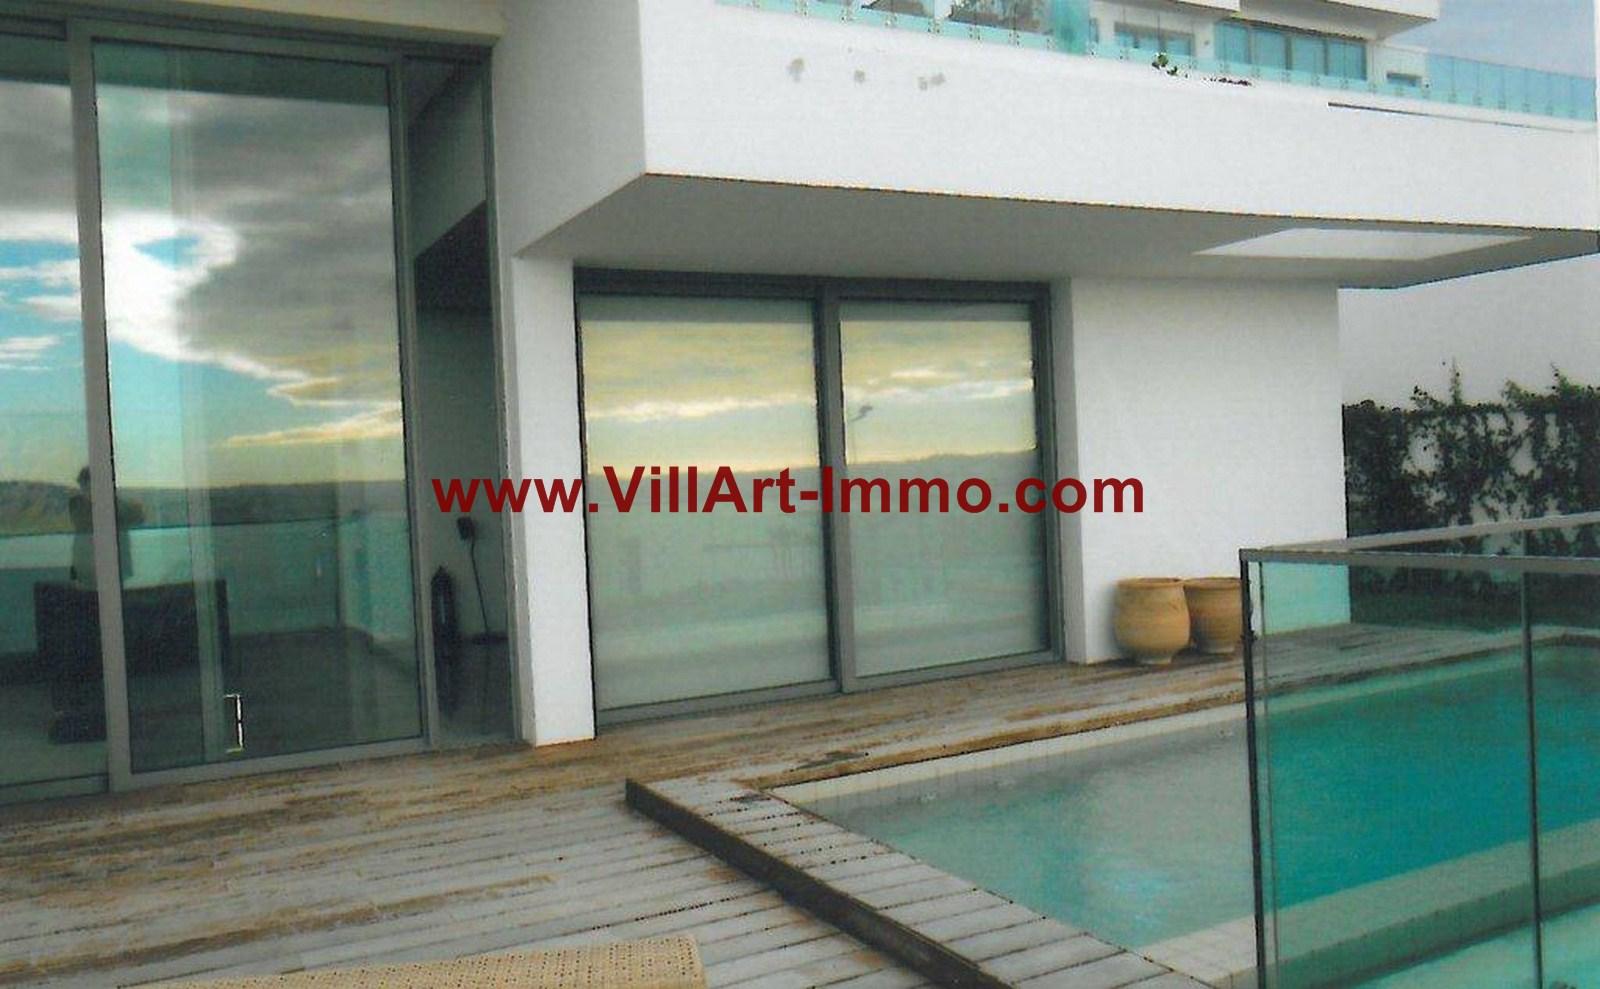 10-Location-Appartement-Meublé-Tanger-Piscine-L749-Villart immo